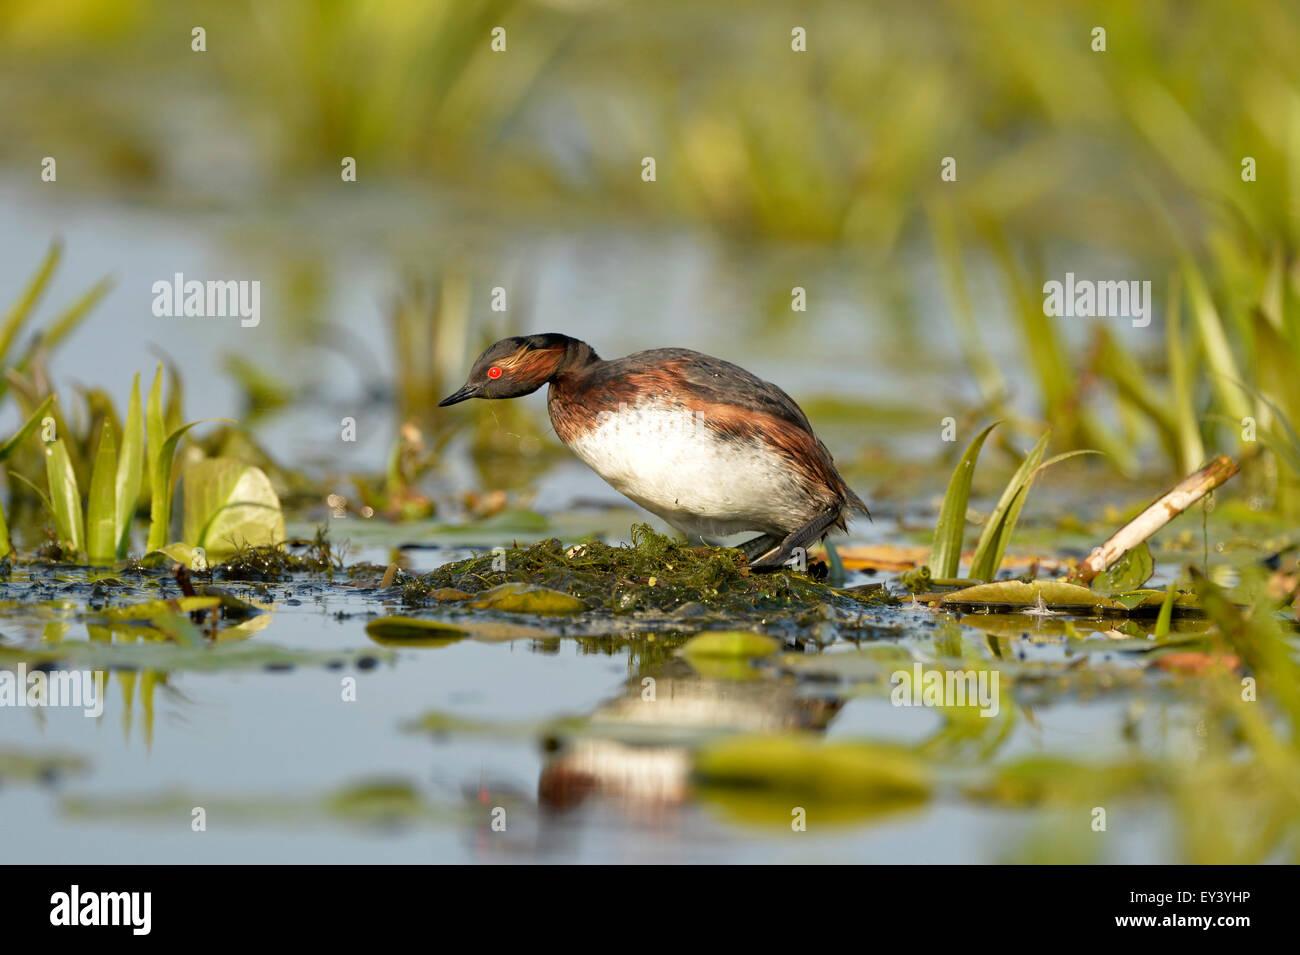 Black-necked Grebe (Podiceps nigricollis) adult at nest, Danube delta, Romania, May - Stock Image